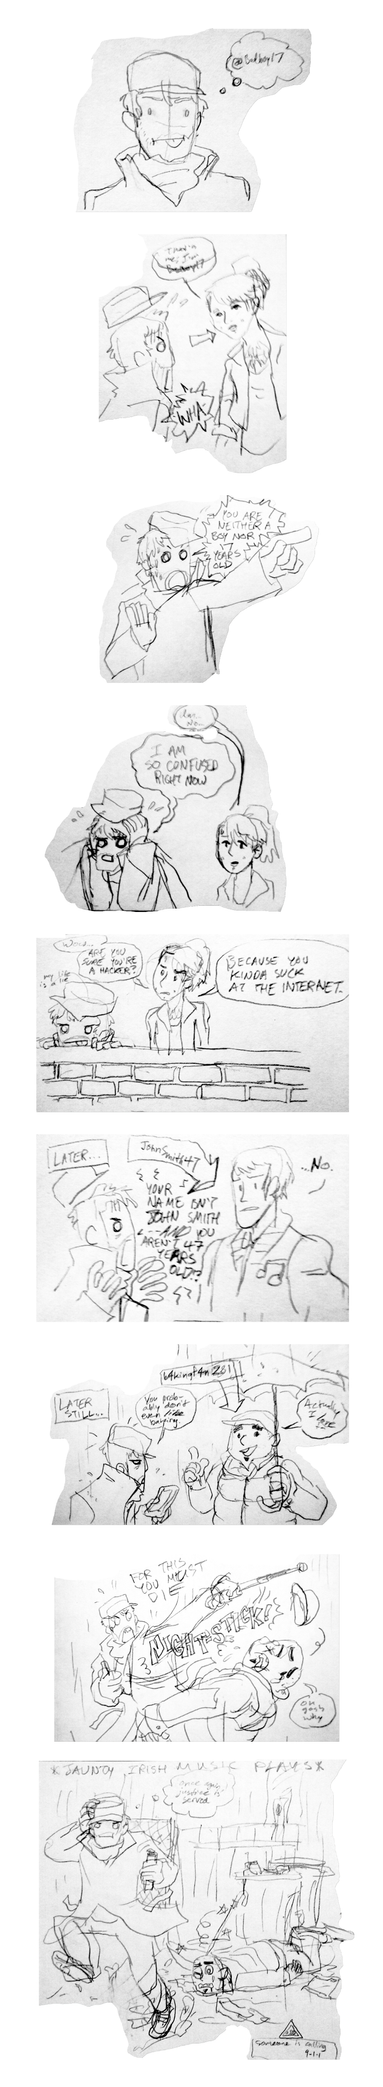 Sketch Comic - Watch_Derps by animatrix1490